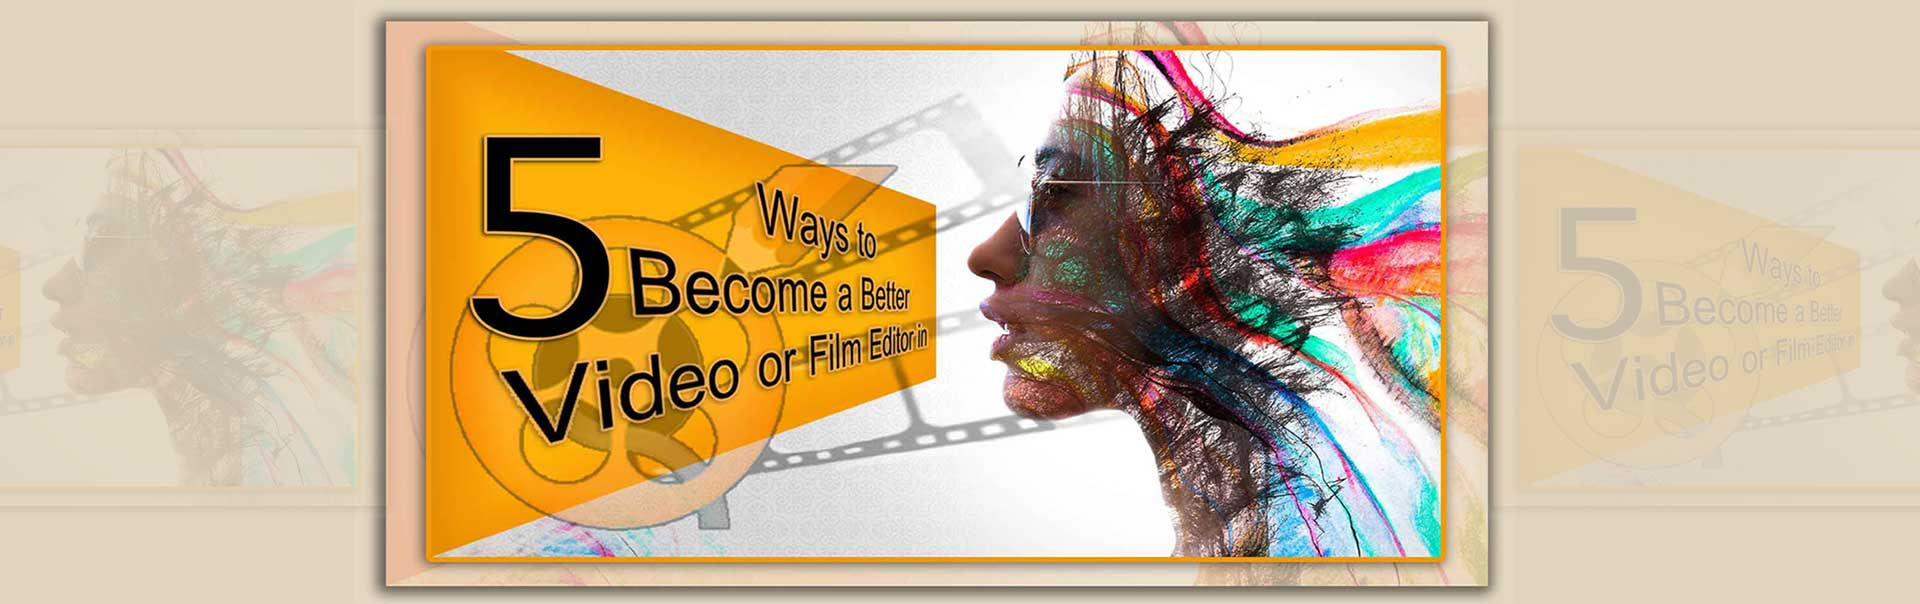 Video Editing bes1 2 3 - چگونه تدوینگر شویم ؟ 5 روش